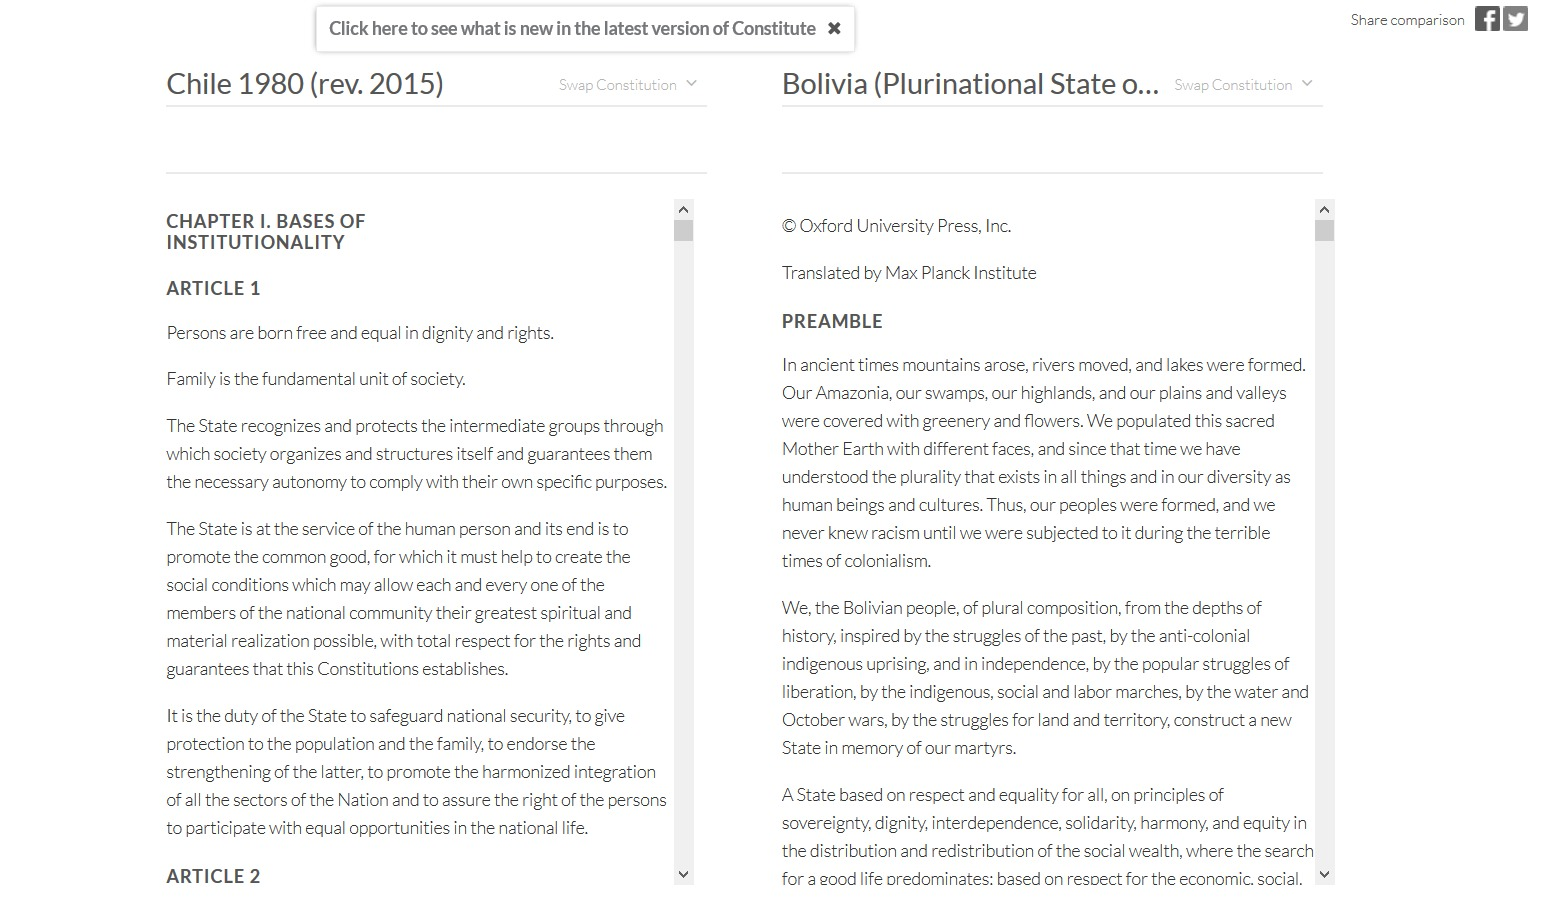 Constituciones Chile y Bolivia